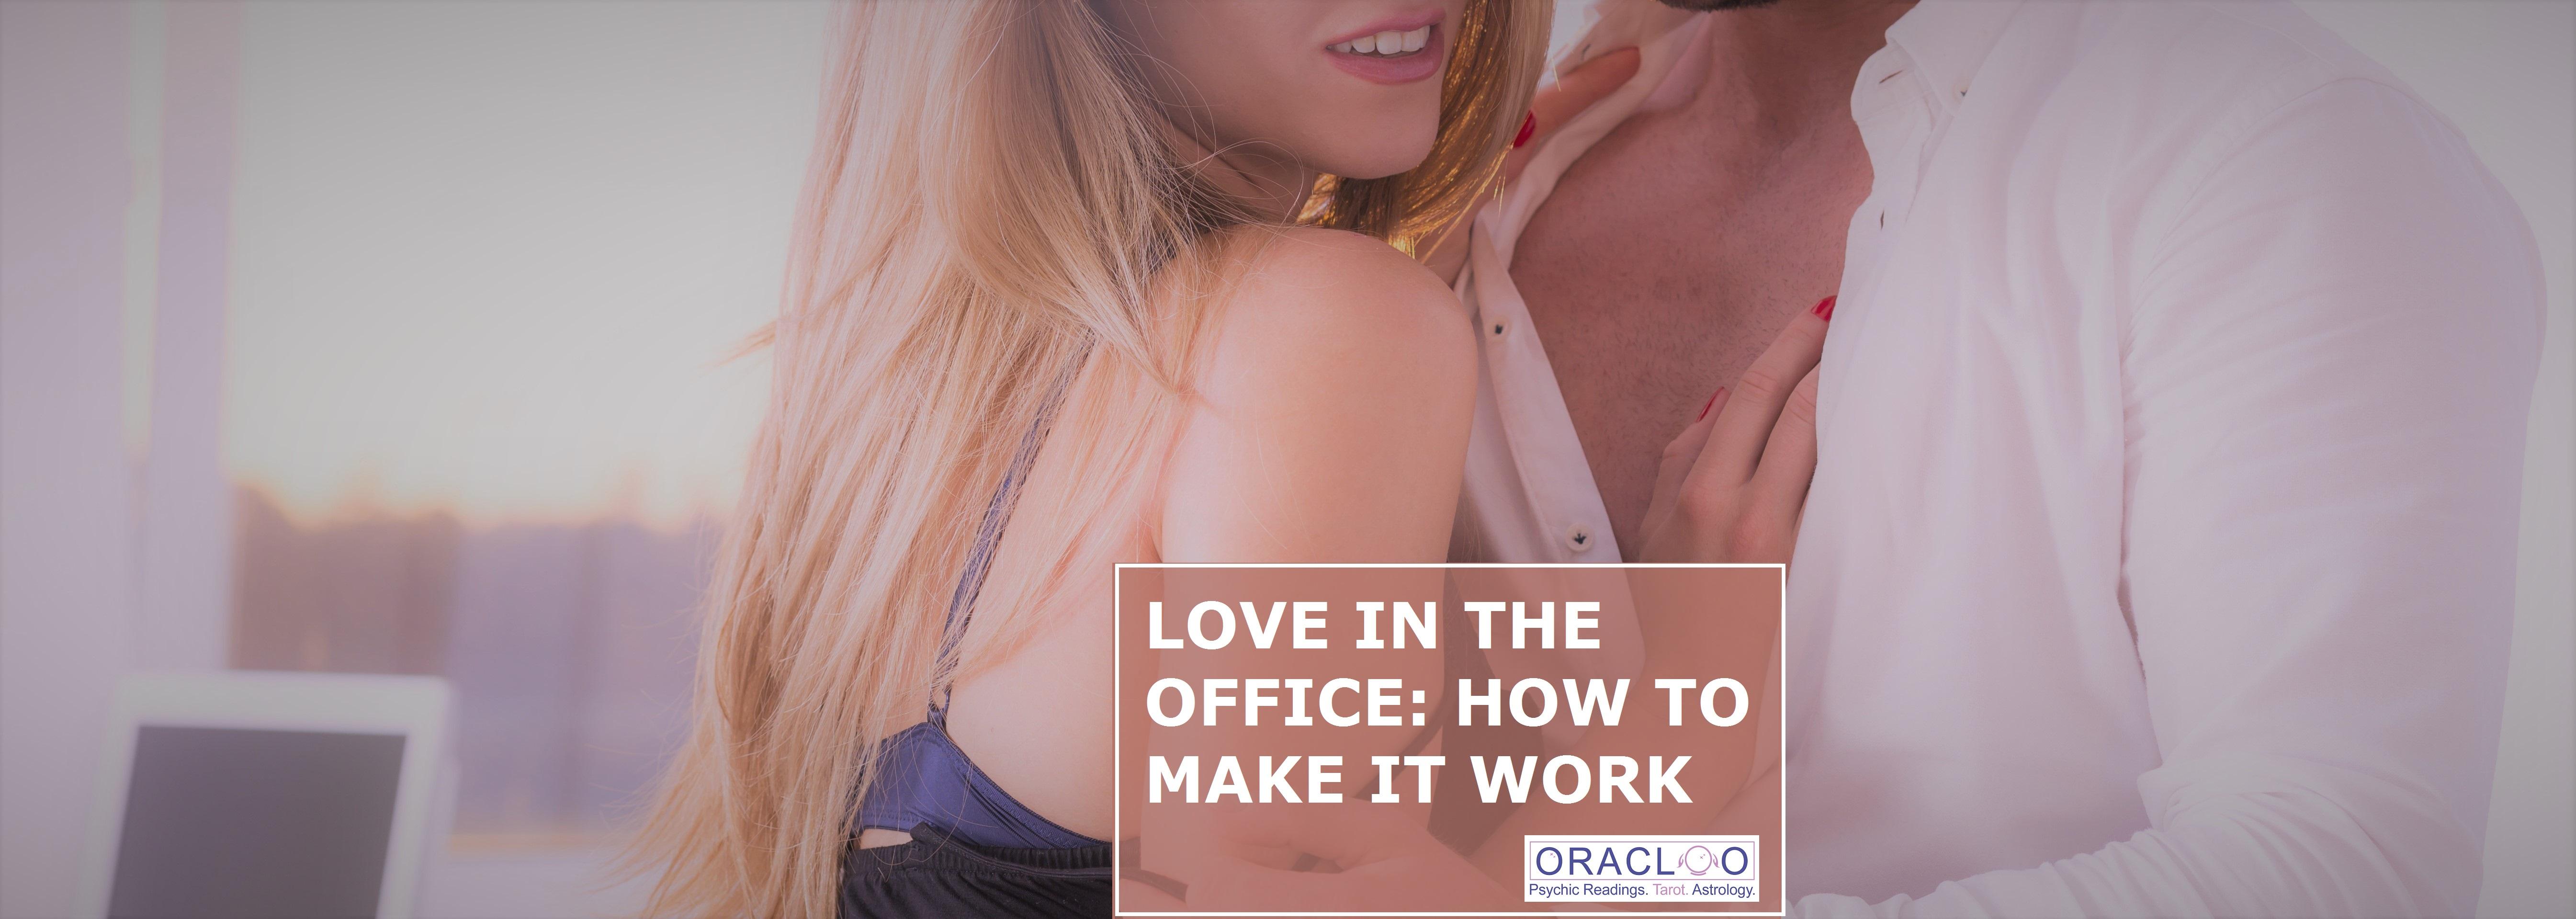 Office Romance Oracloo